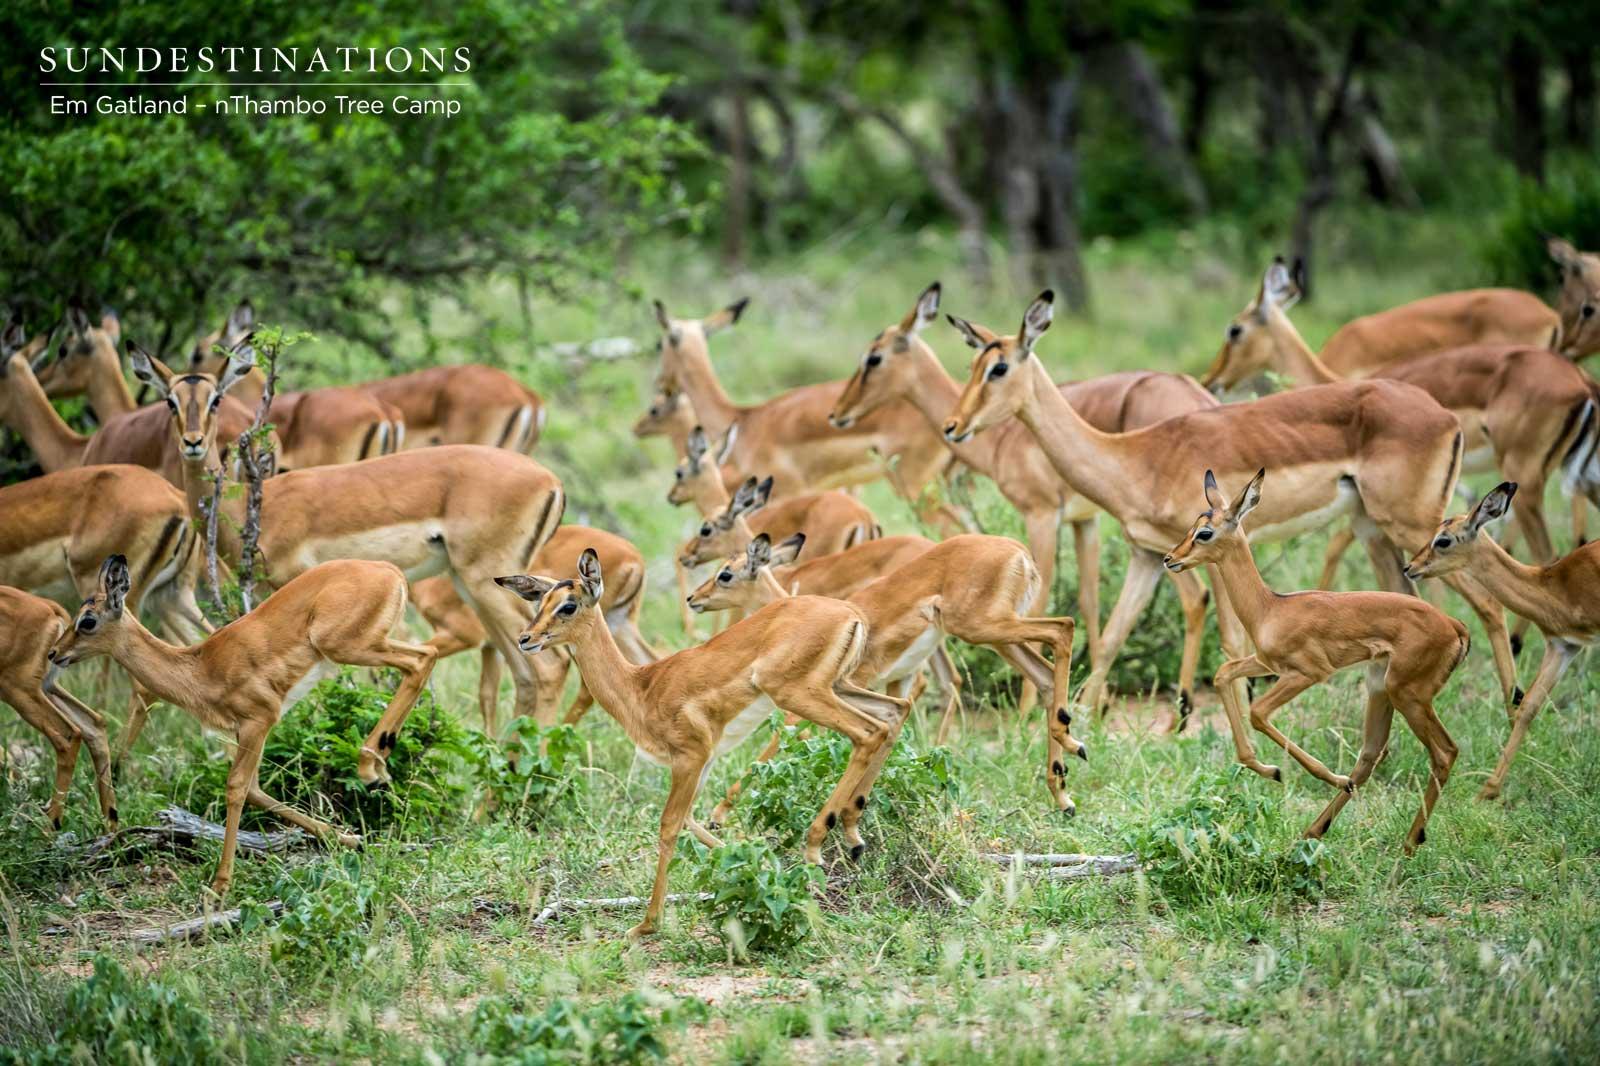 Impala Herds at nThambo Tree Camp